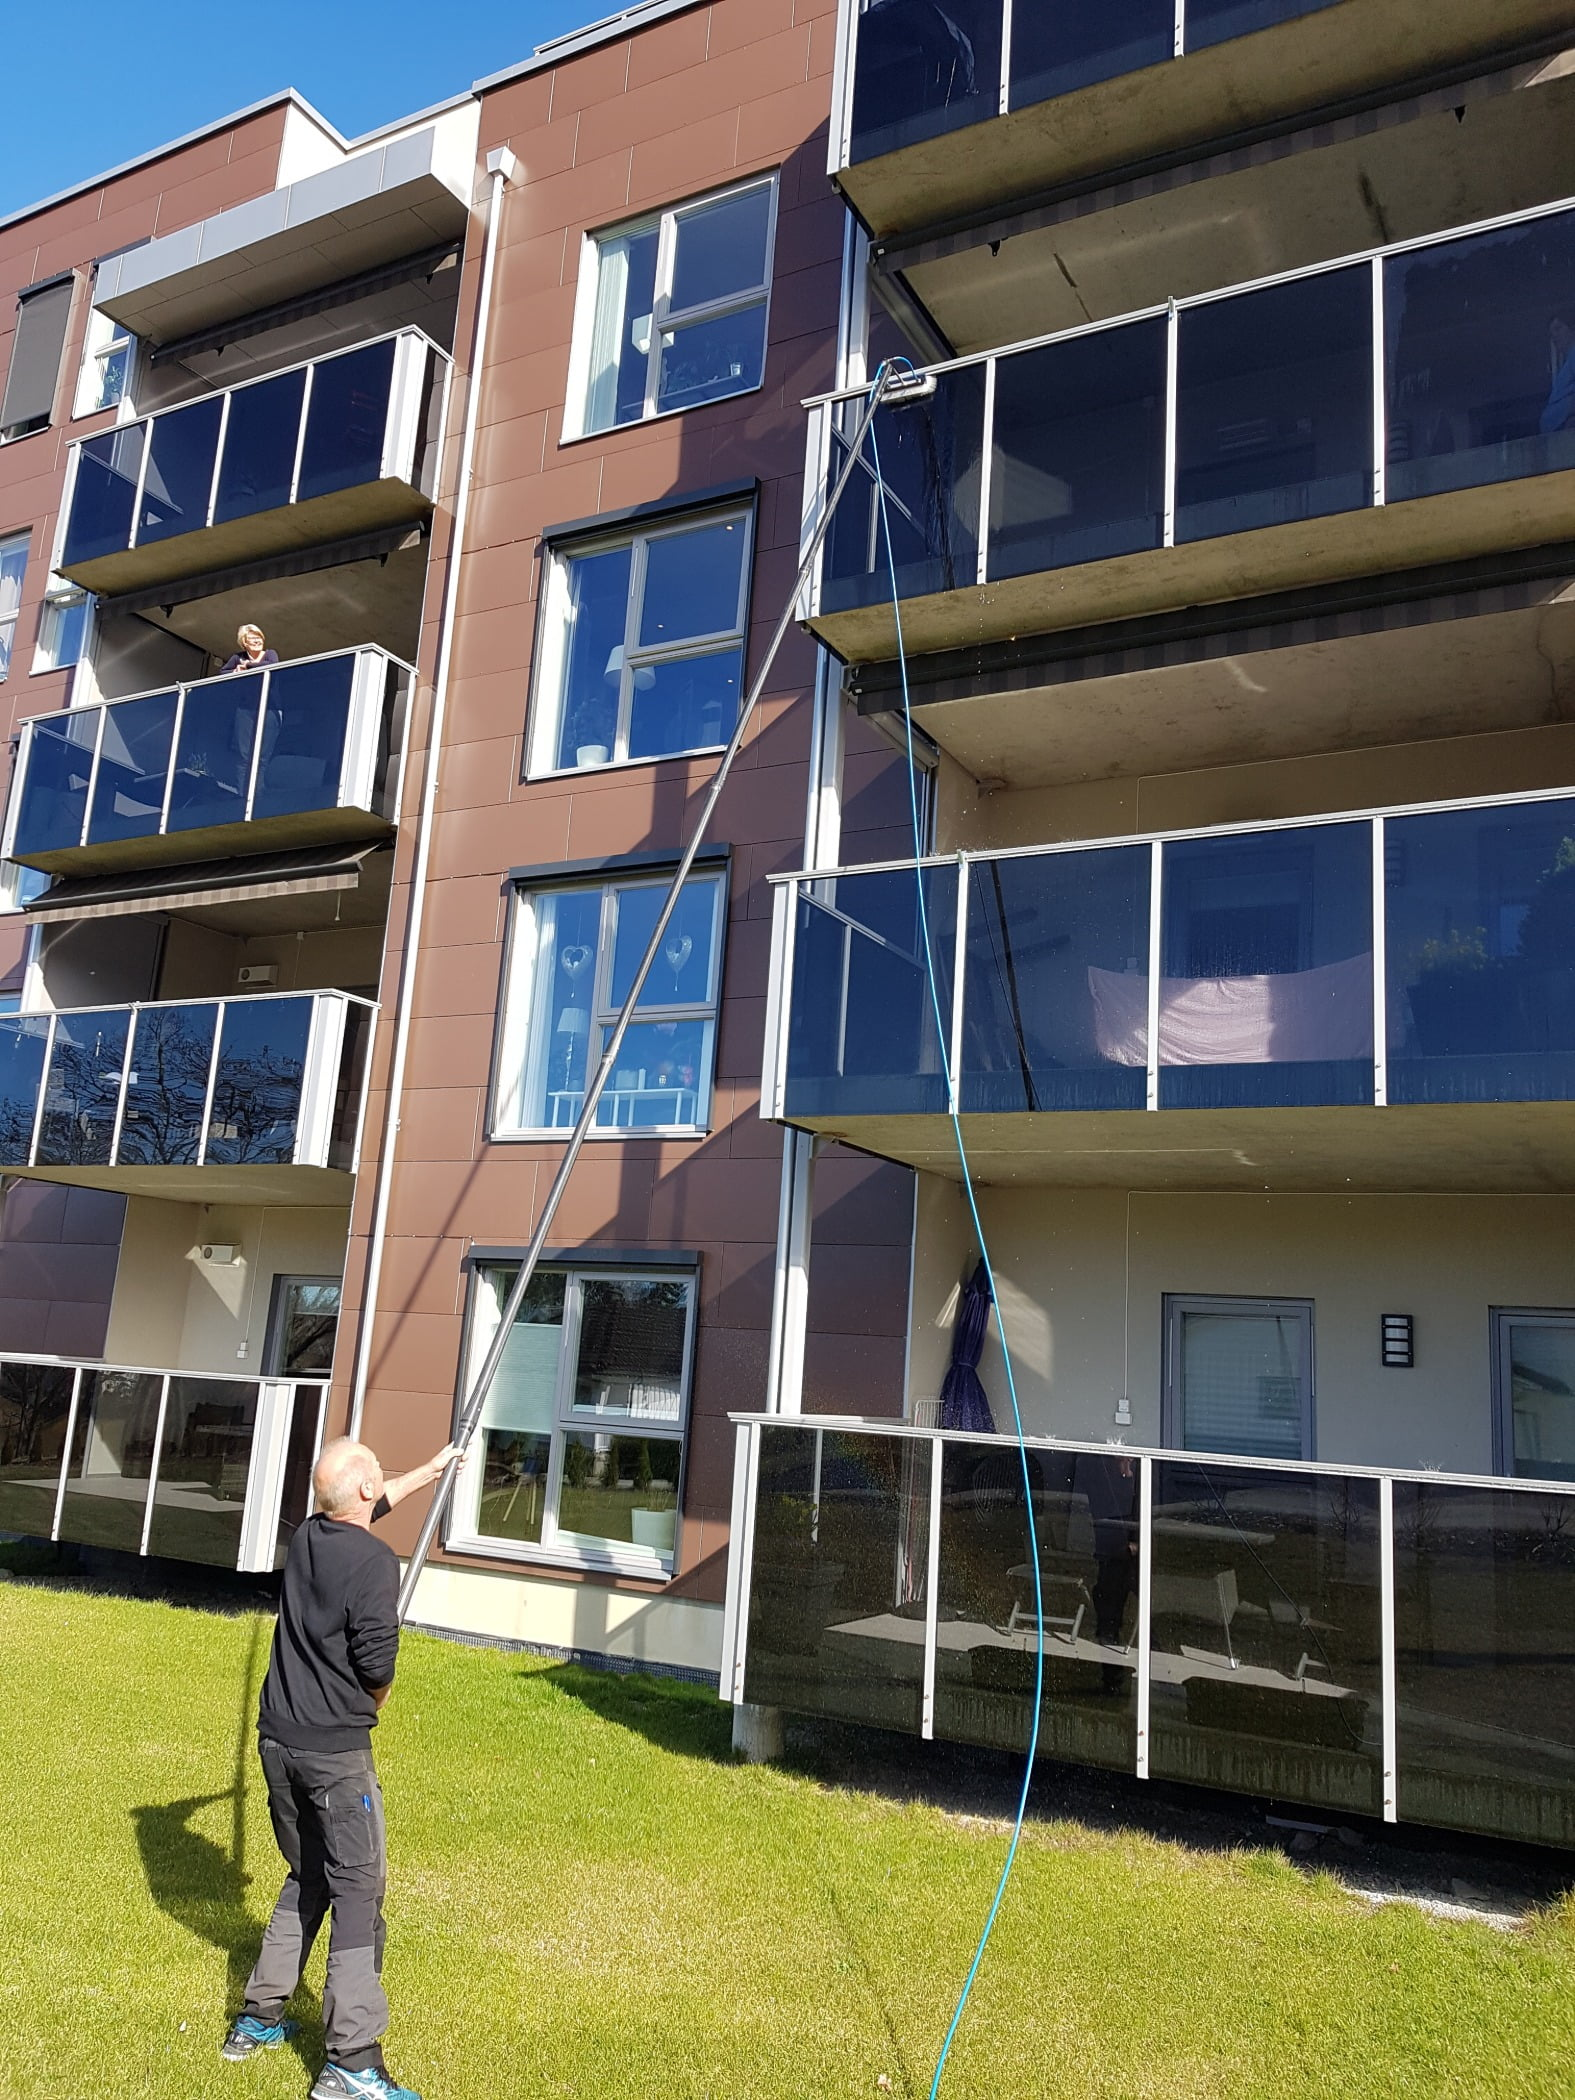 Tower block, Urban design, Residential area, Building, Window, Architecture, Condominium, Grass, Neighbourhood, Plant